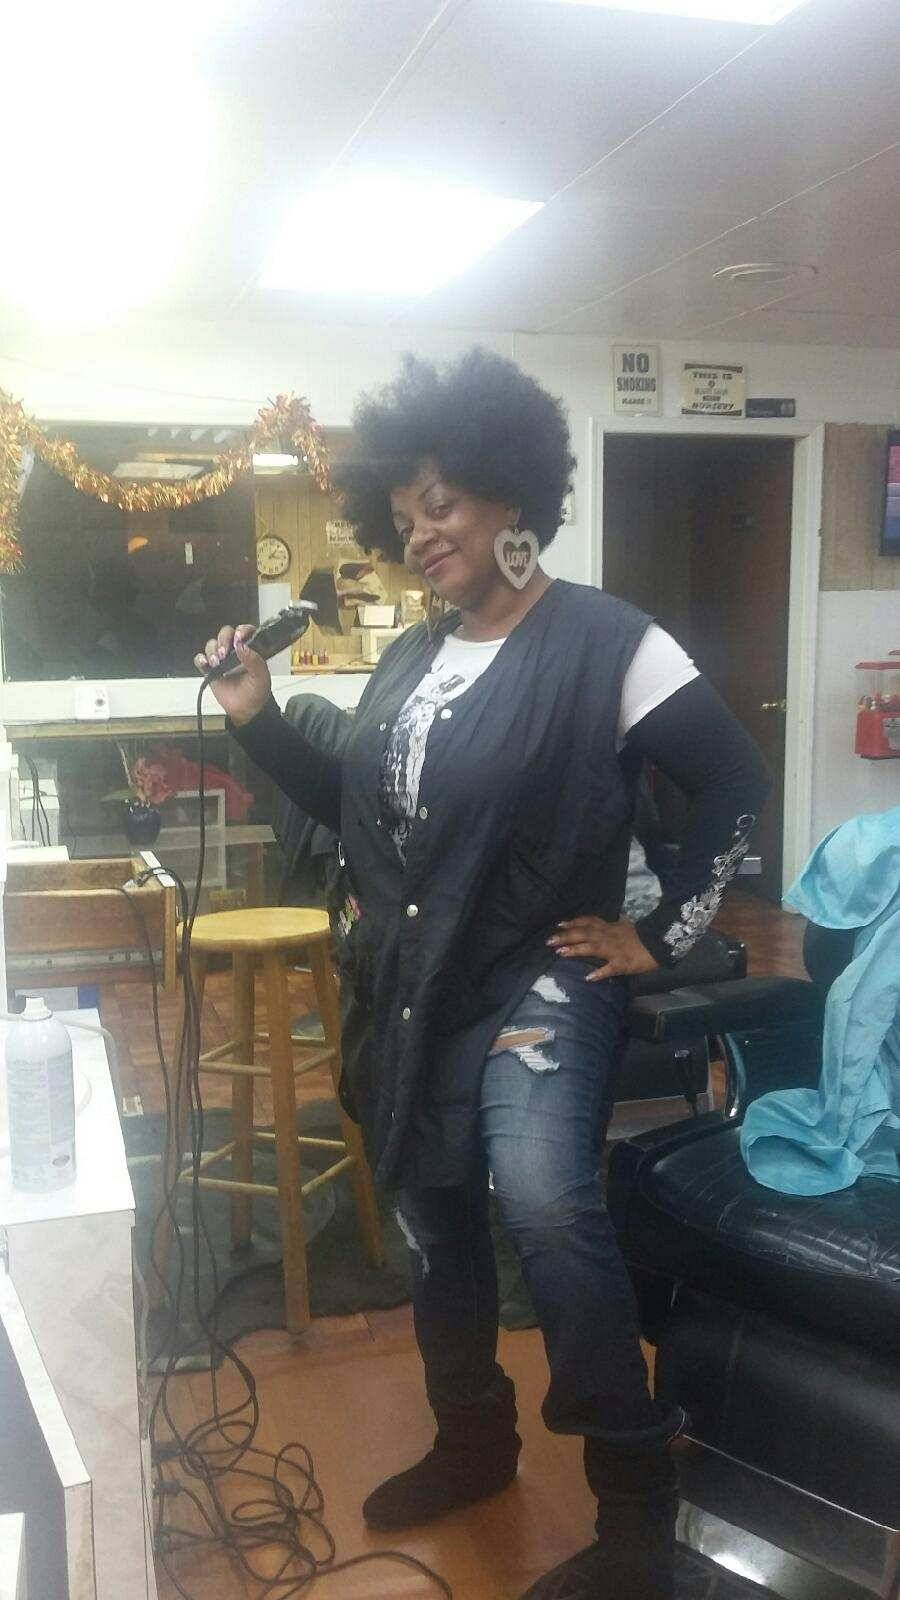 Adams & Sons Styling Center - hair care  | Photo 8 of 10 | Address: 1521 NE 23rd St, Oklahoma City, OK 73111, USA | Phone: (405) 427-3525